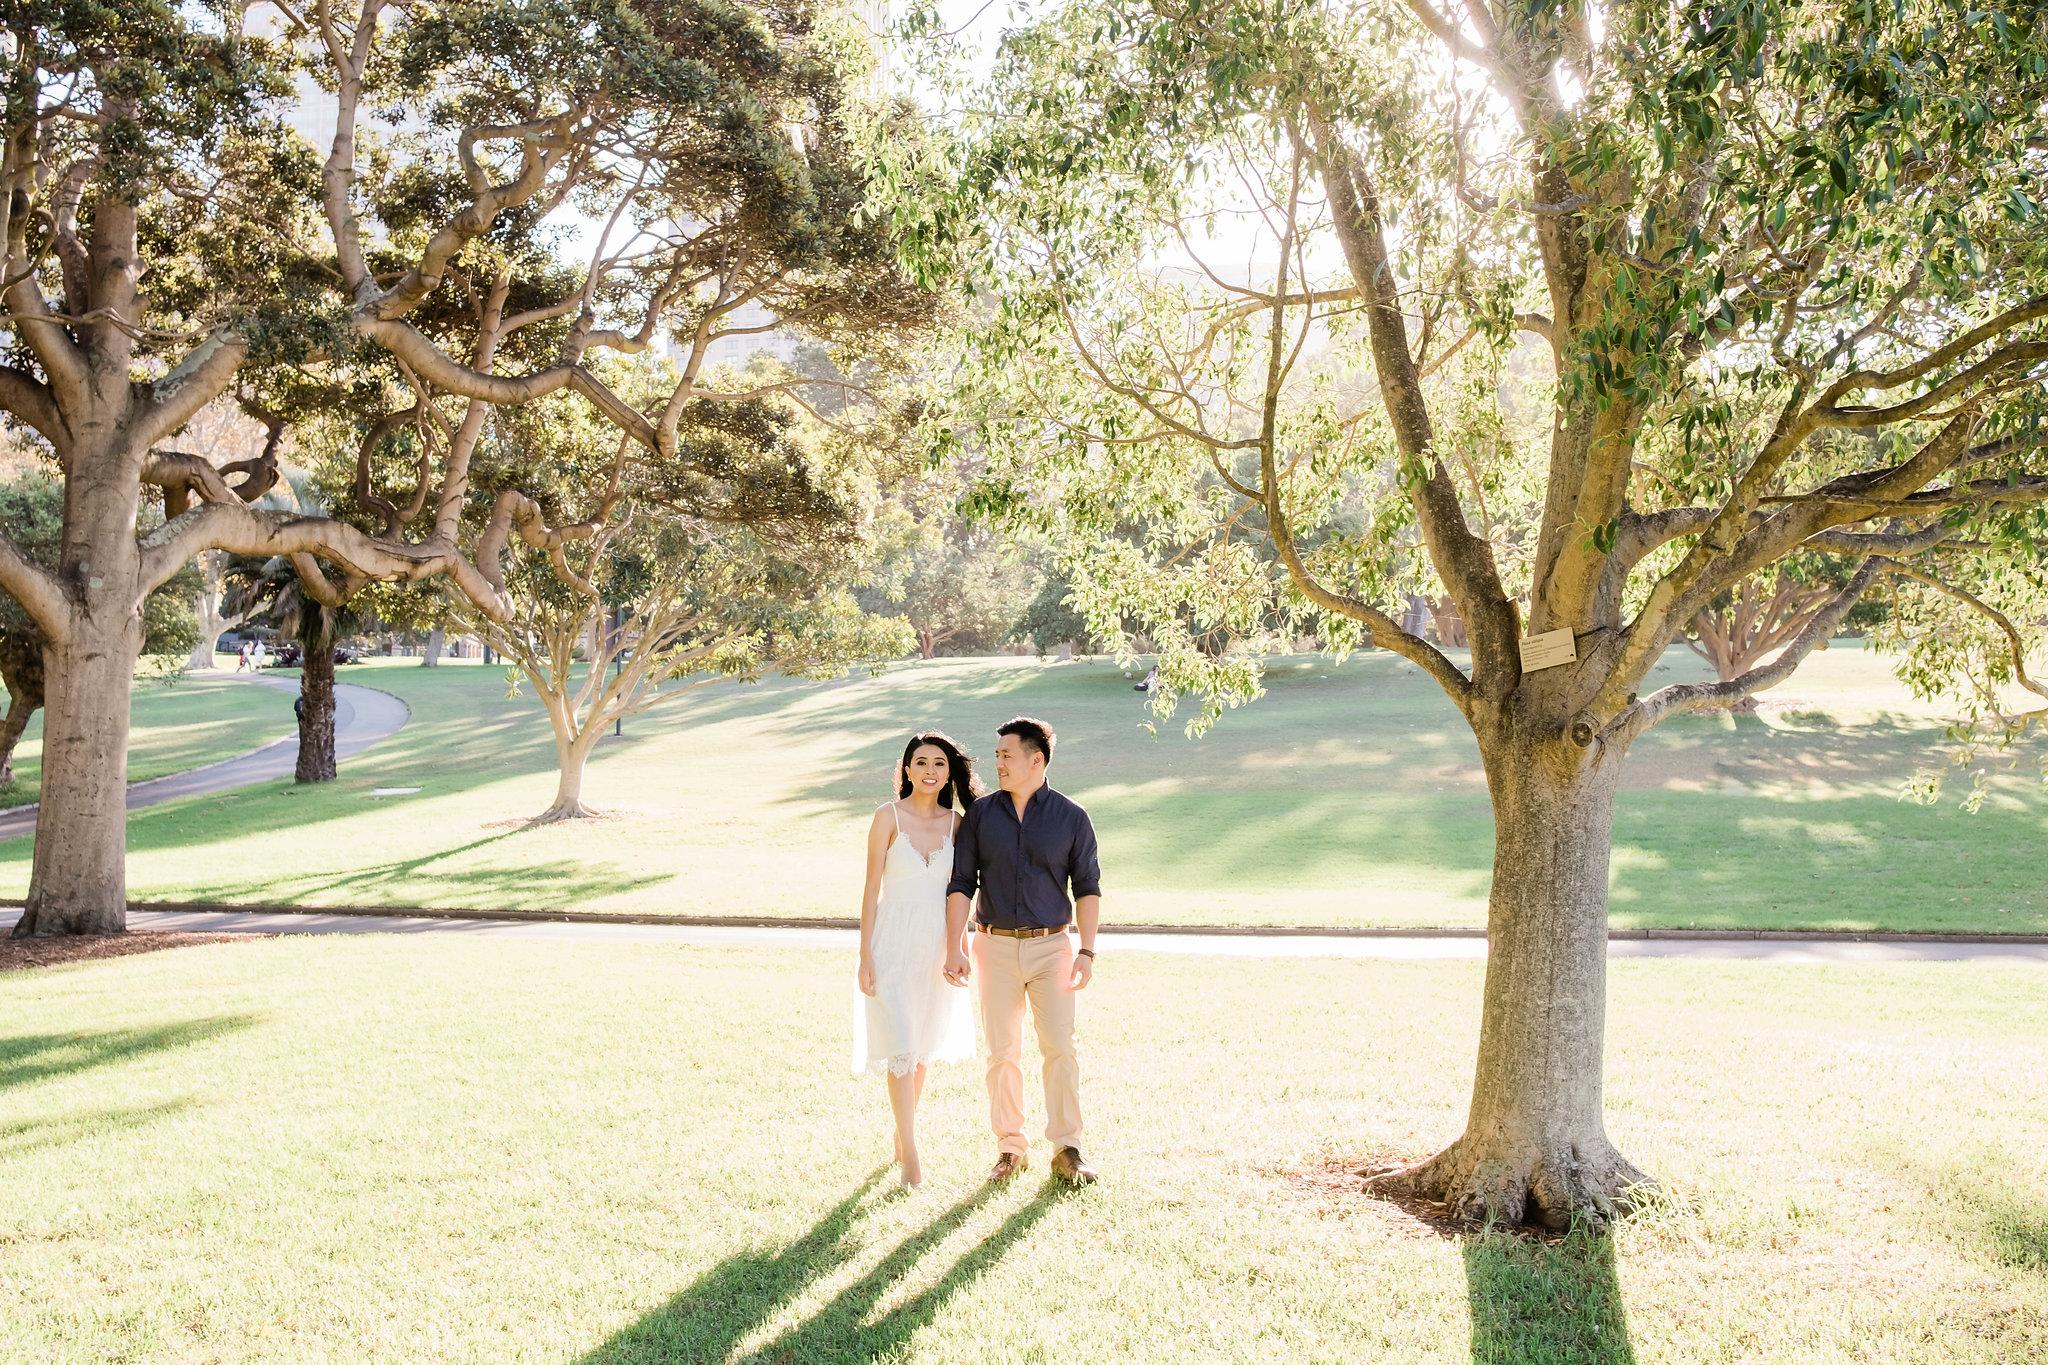 sydney engagement photography Sydney Botanic Garden-022.jpg